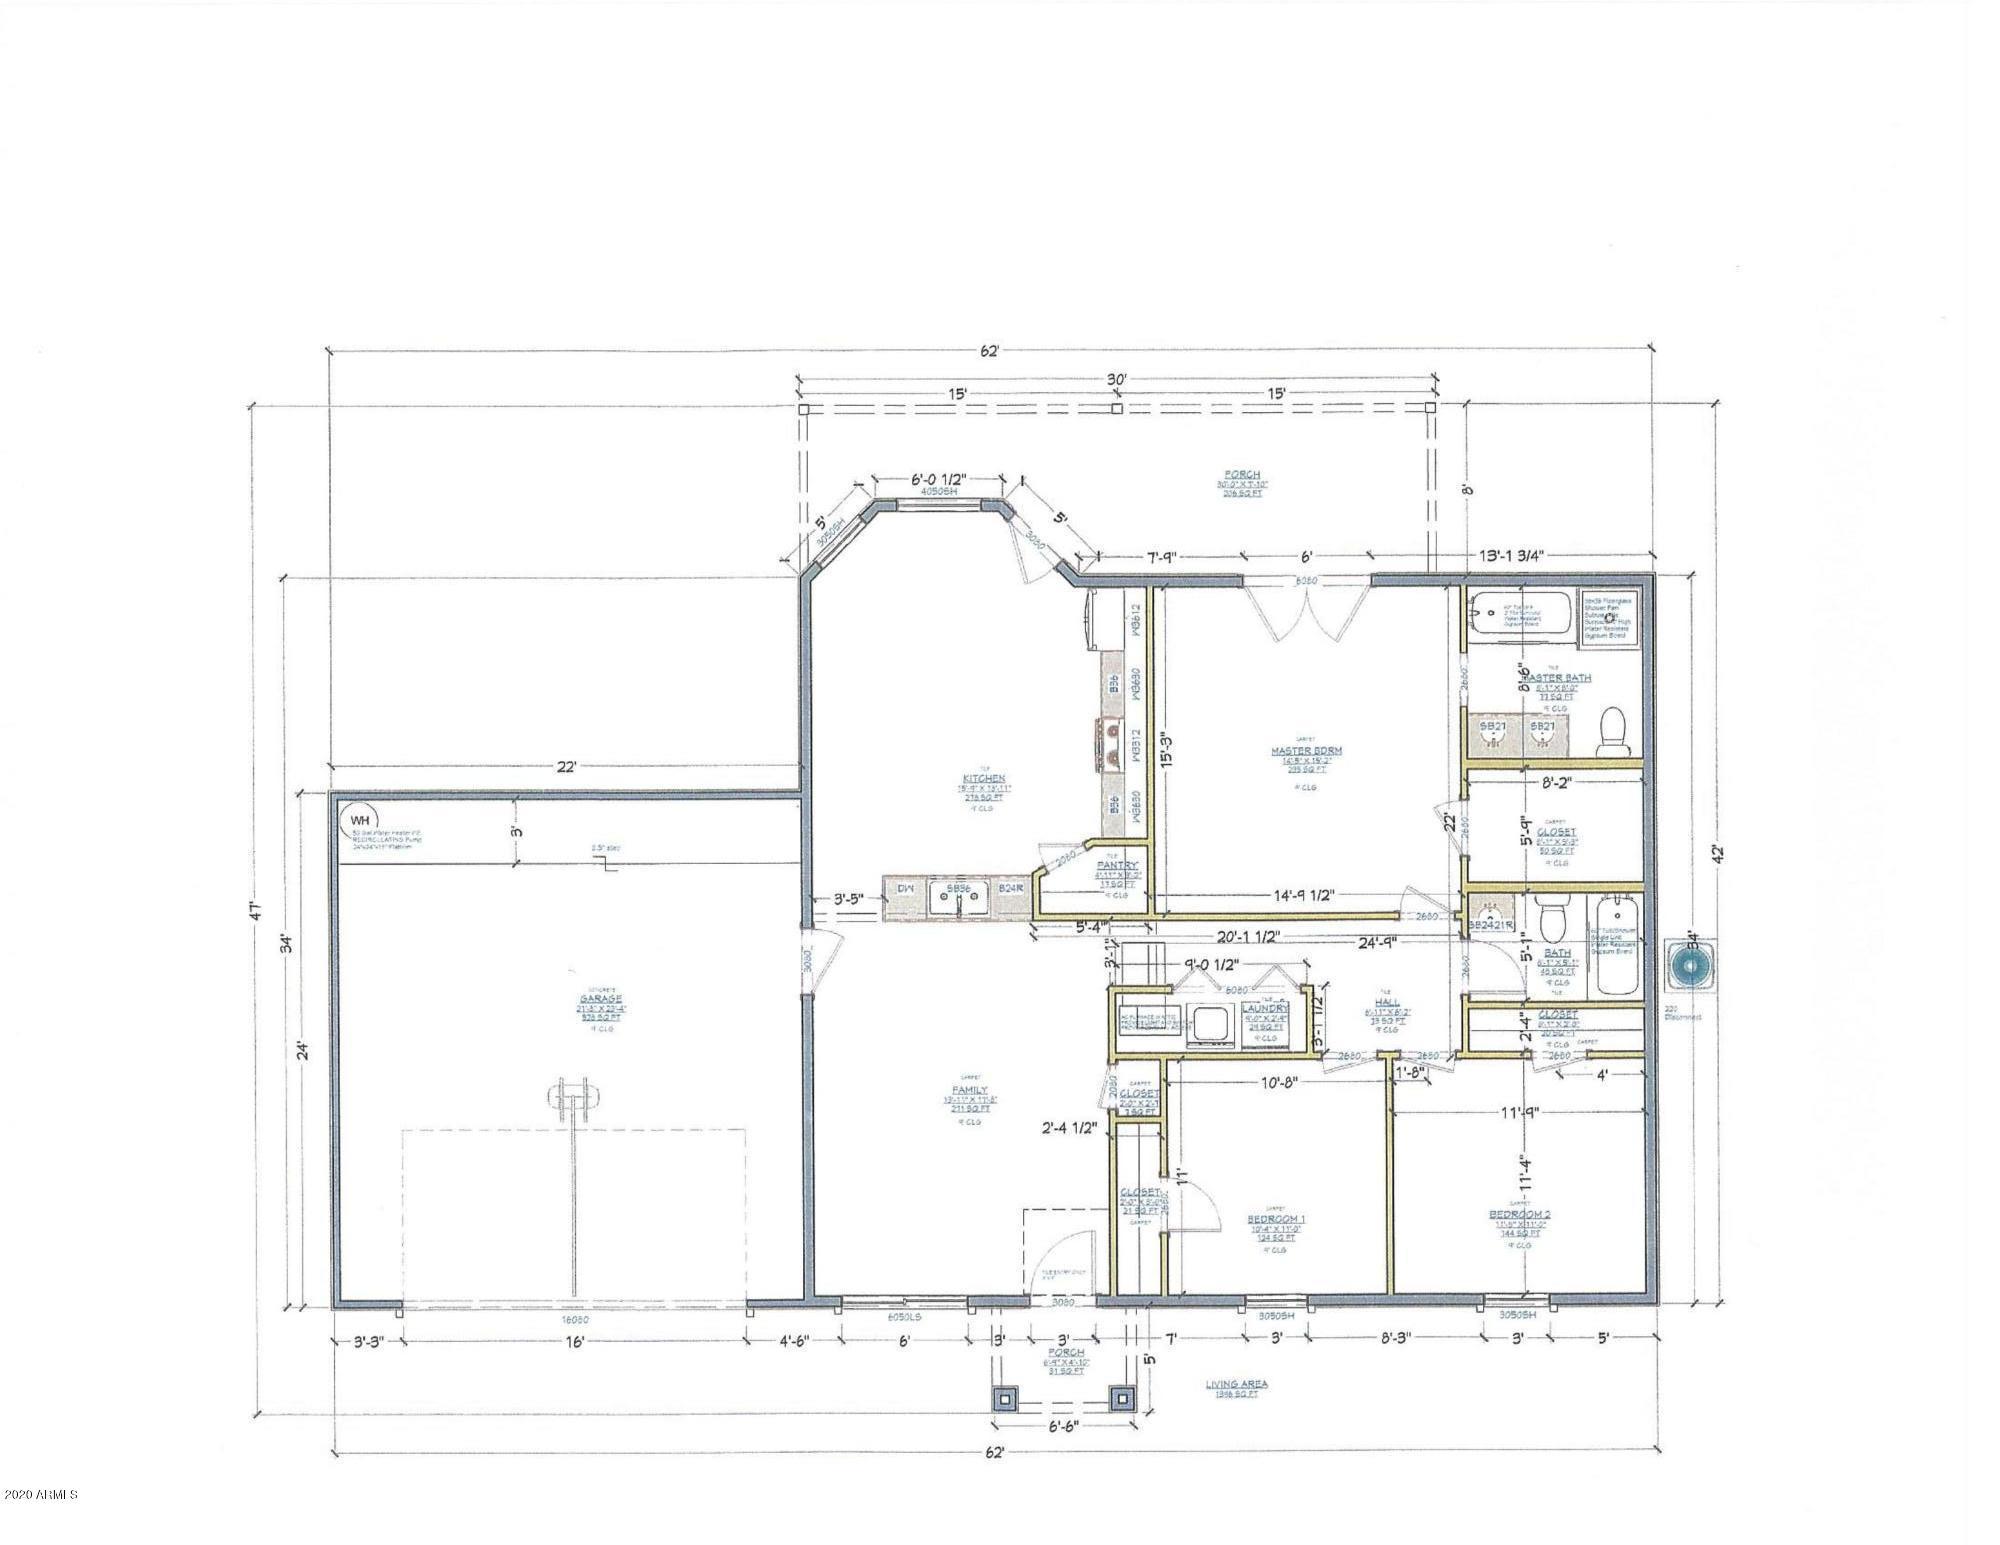 11540 E 4TH Avenue, Apache Junction, Arizona 85120, 3 Bedrooms Bedrooms, ,2 BathroomsBathrooms,Single Family,For Sale,11540 E 4TH Avenue,1,6210876